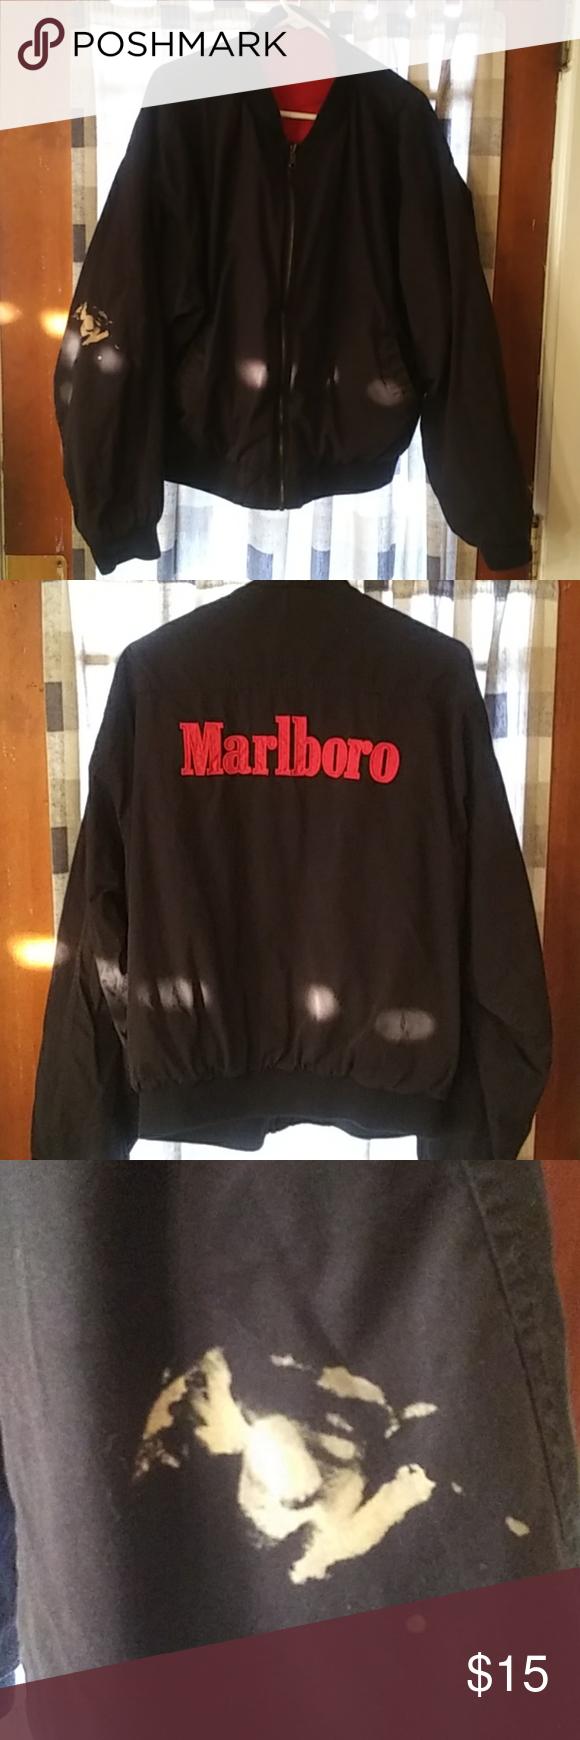 Vintage Reversible Marlboro Jacket In 2020 Marlboro Jacket Jackets Perfect Vintage